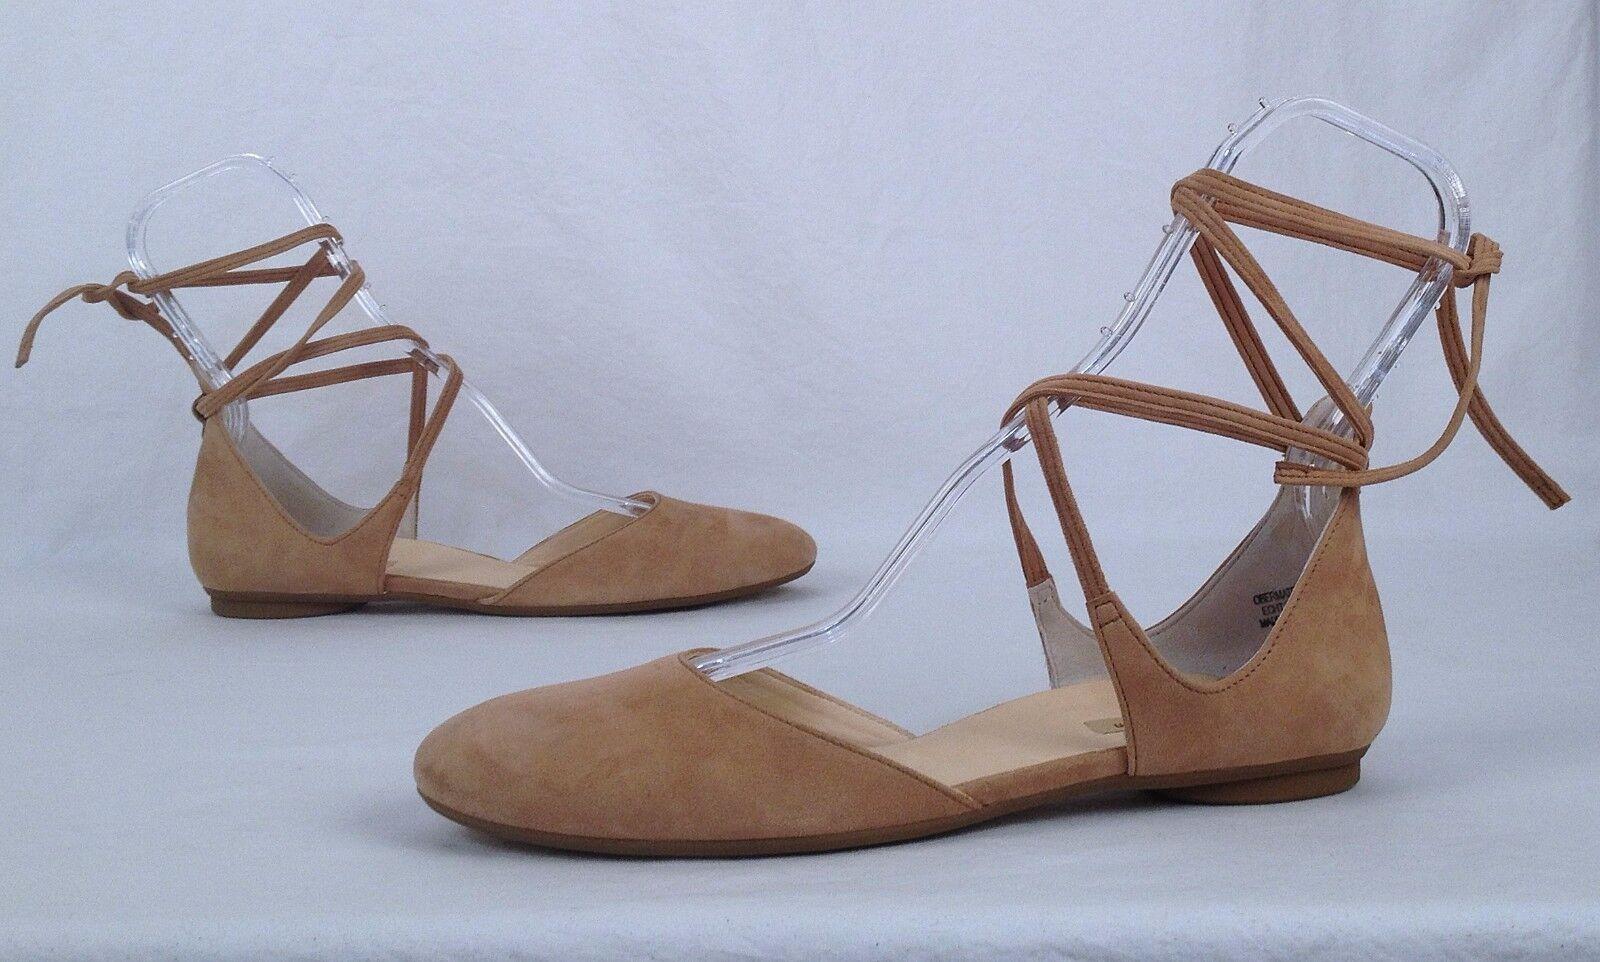 nyA Paul grön Ankle Strap Sandal - Camel - Storlek 9.5 US   7 UK  325 (BB41)